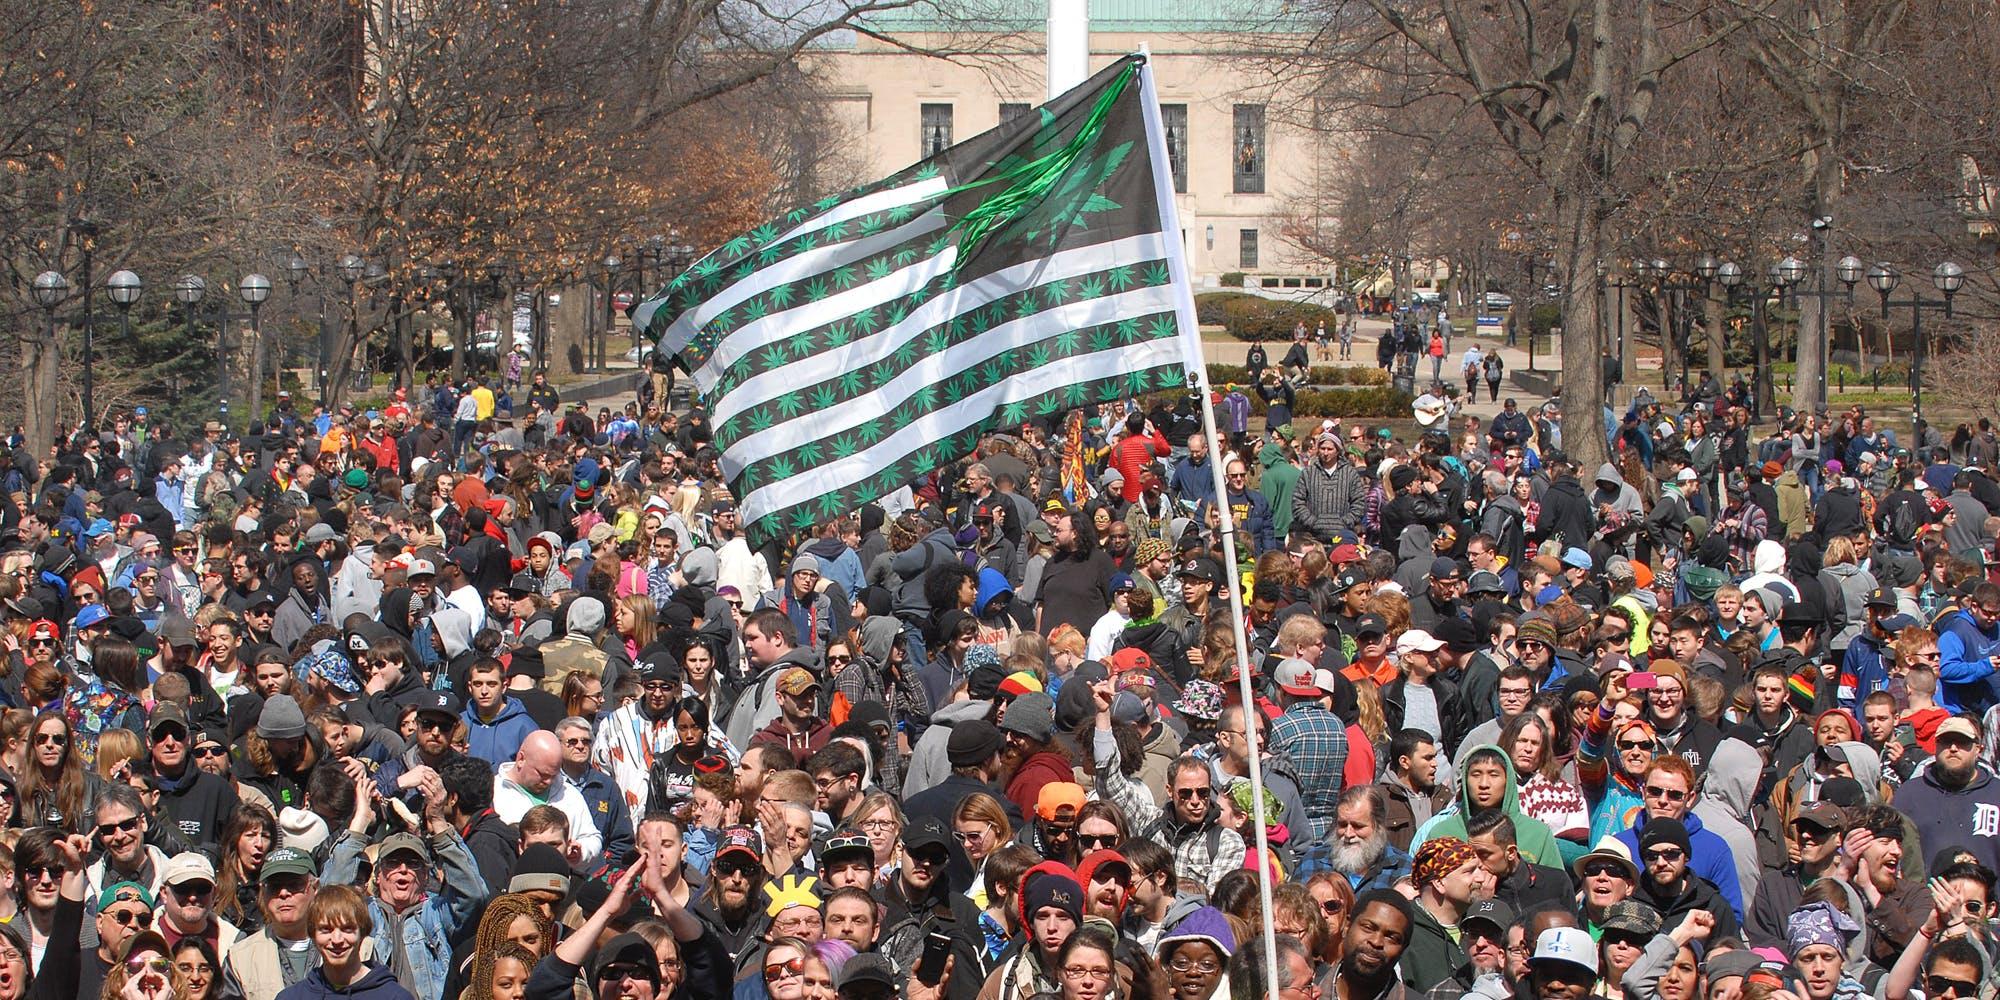 Hash Bash protests for marijuana legalization